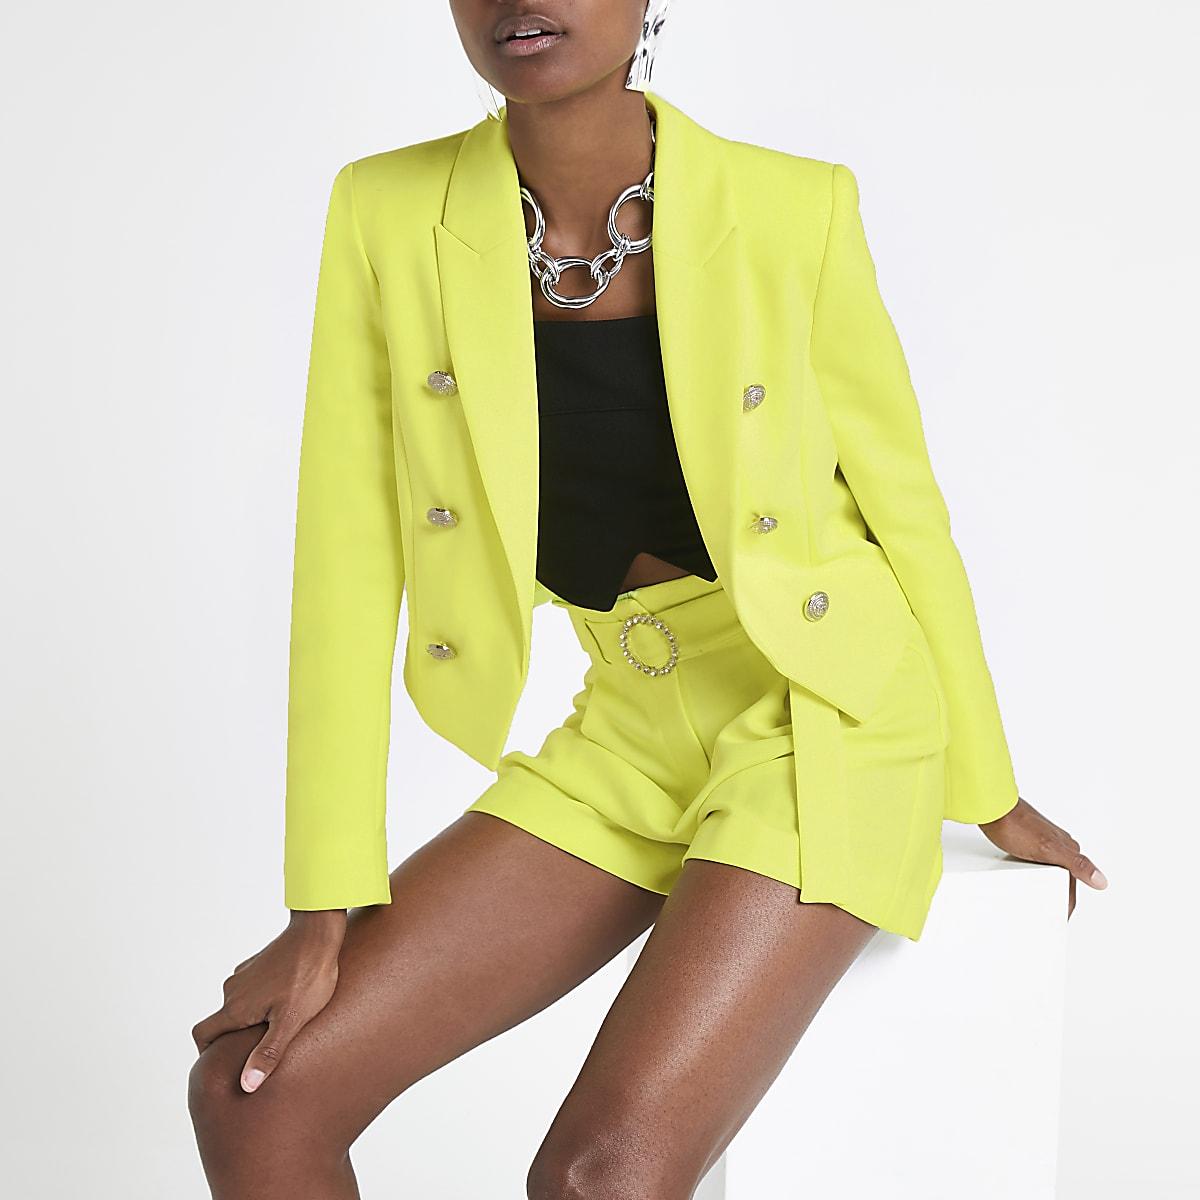 Neon yellow cropped blazer